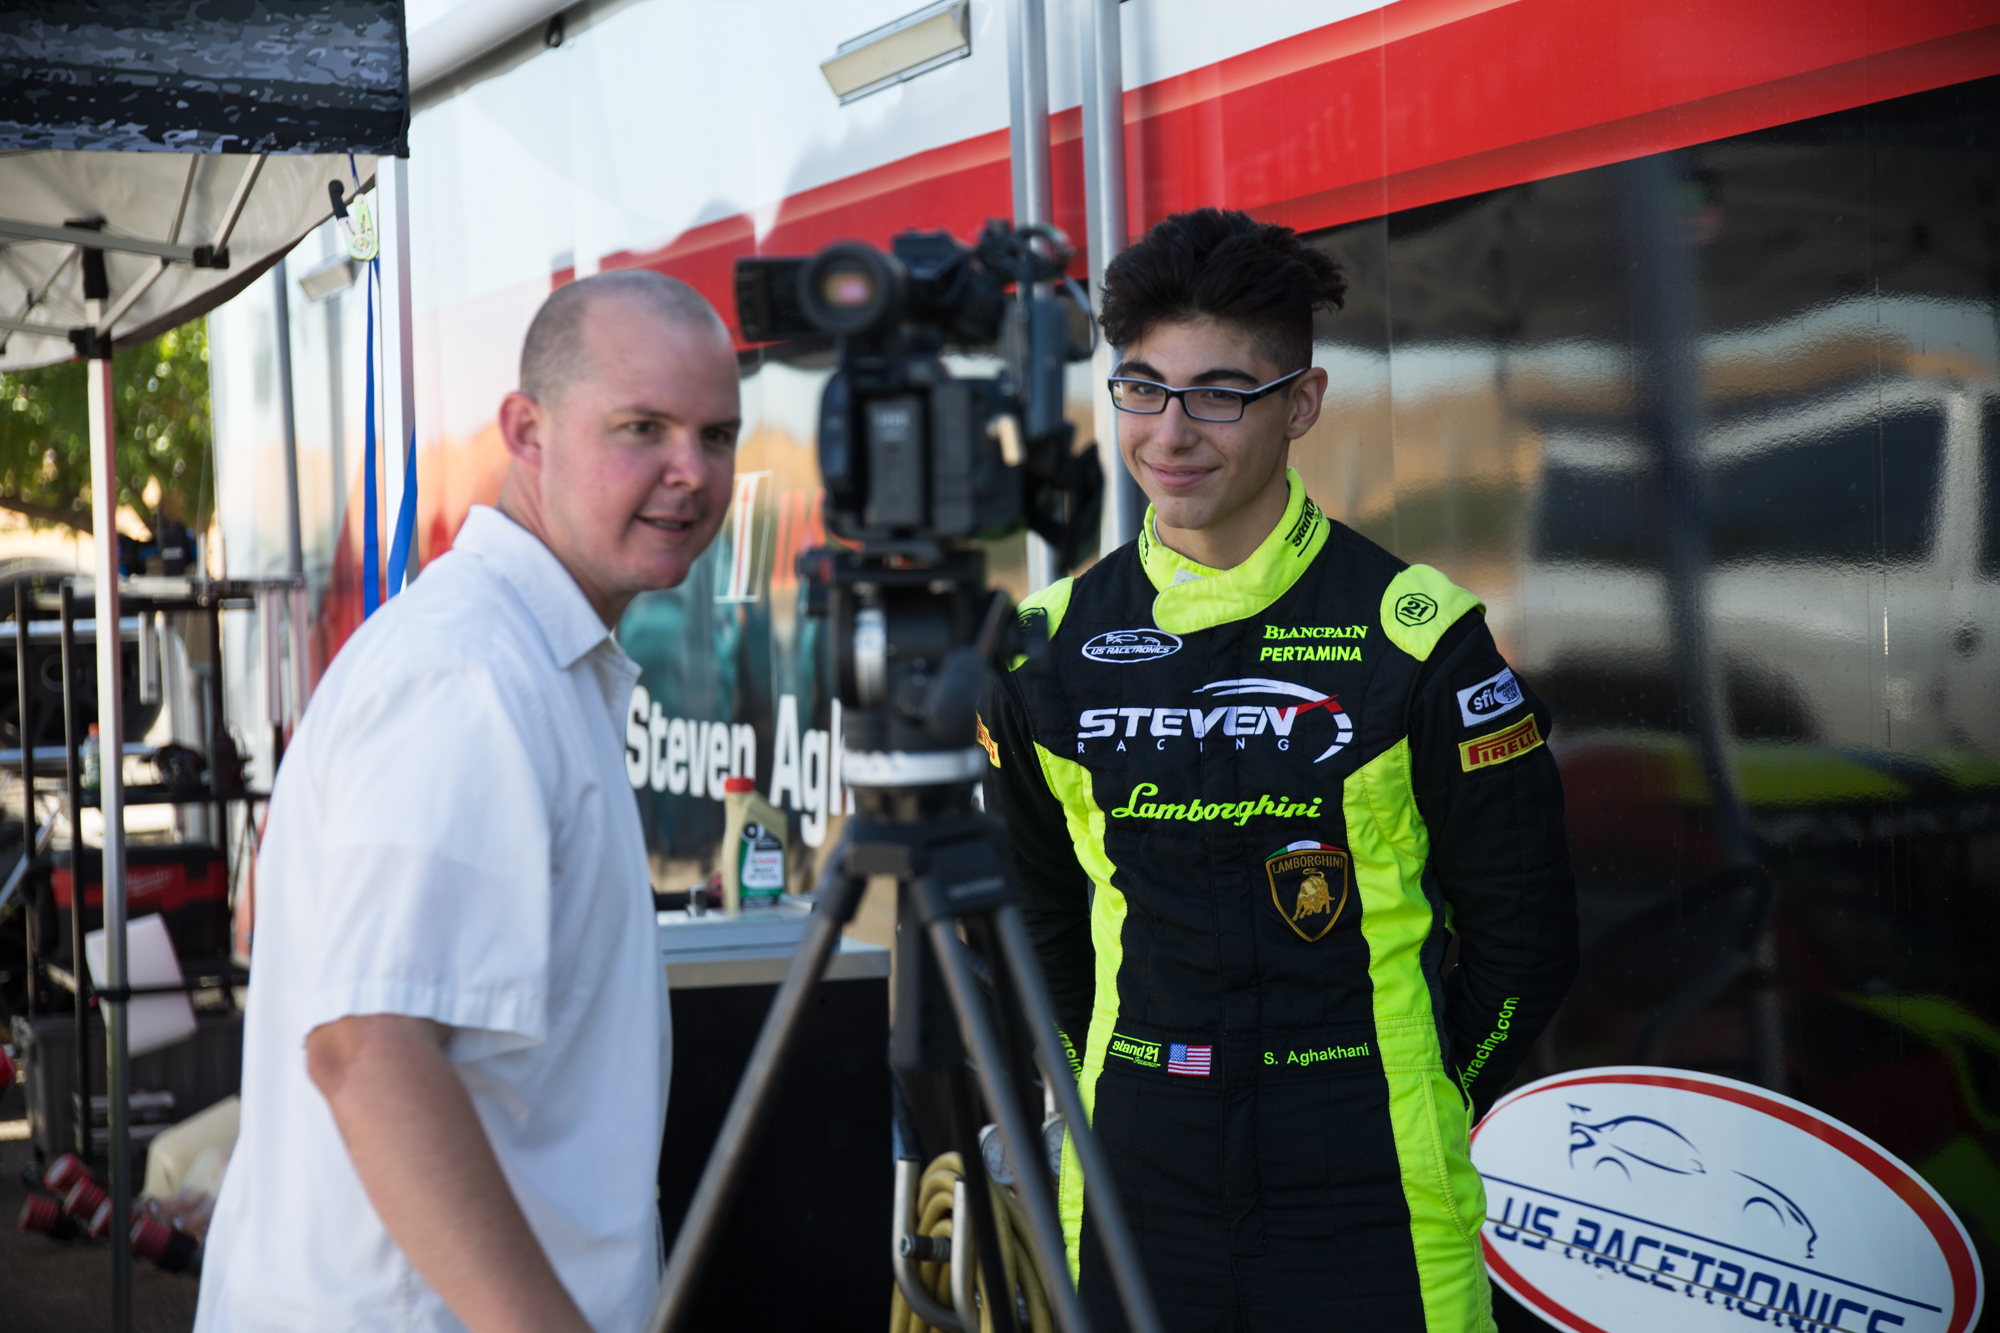 Steven-Racing-20171006-45074.jpg